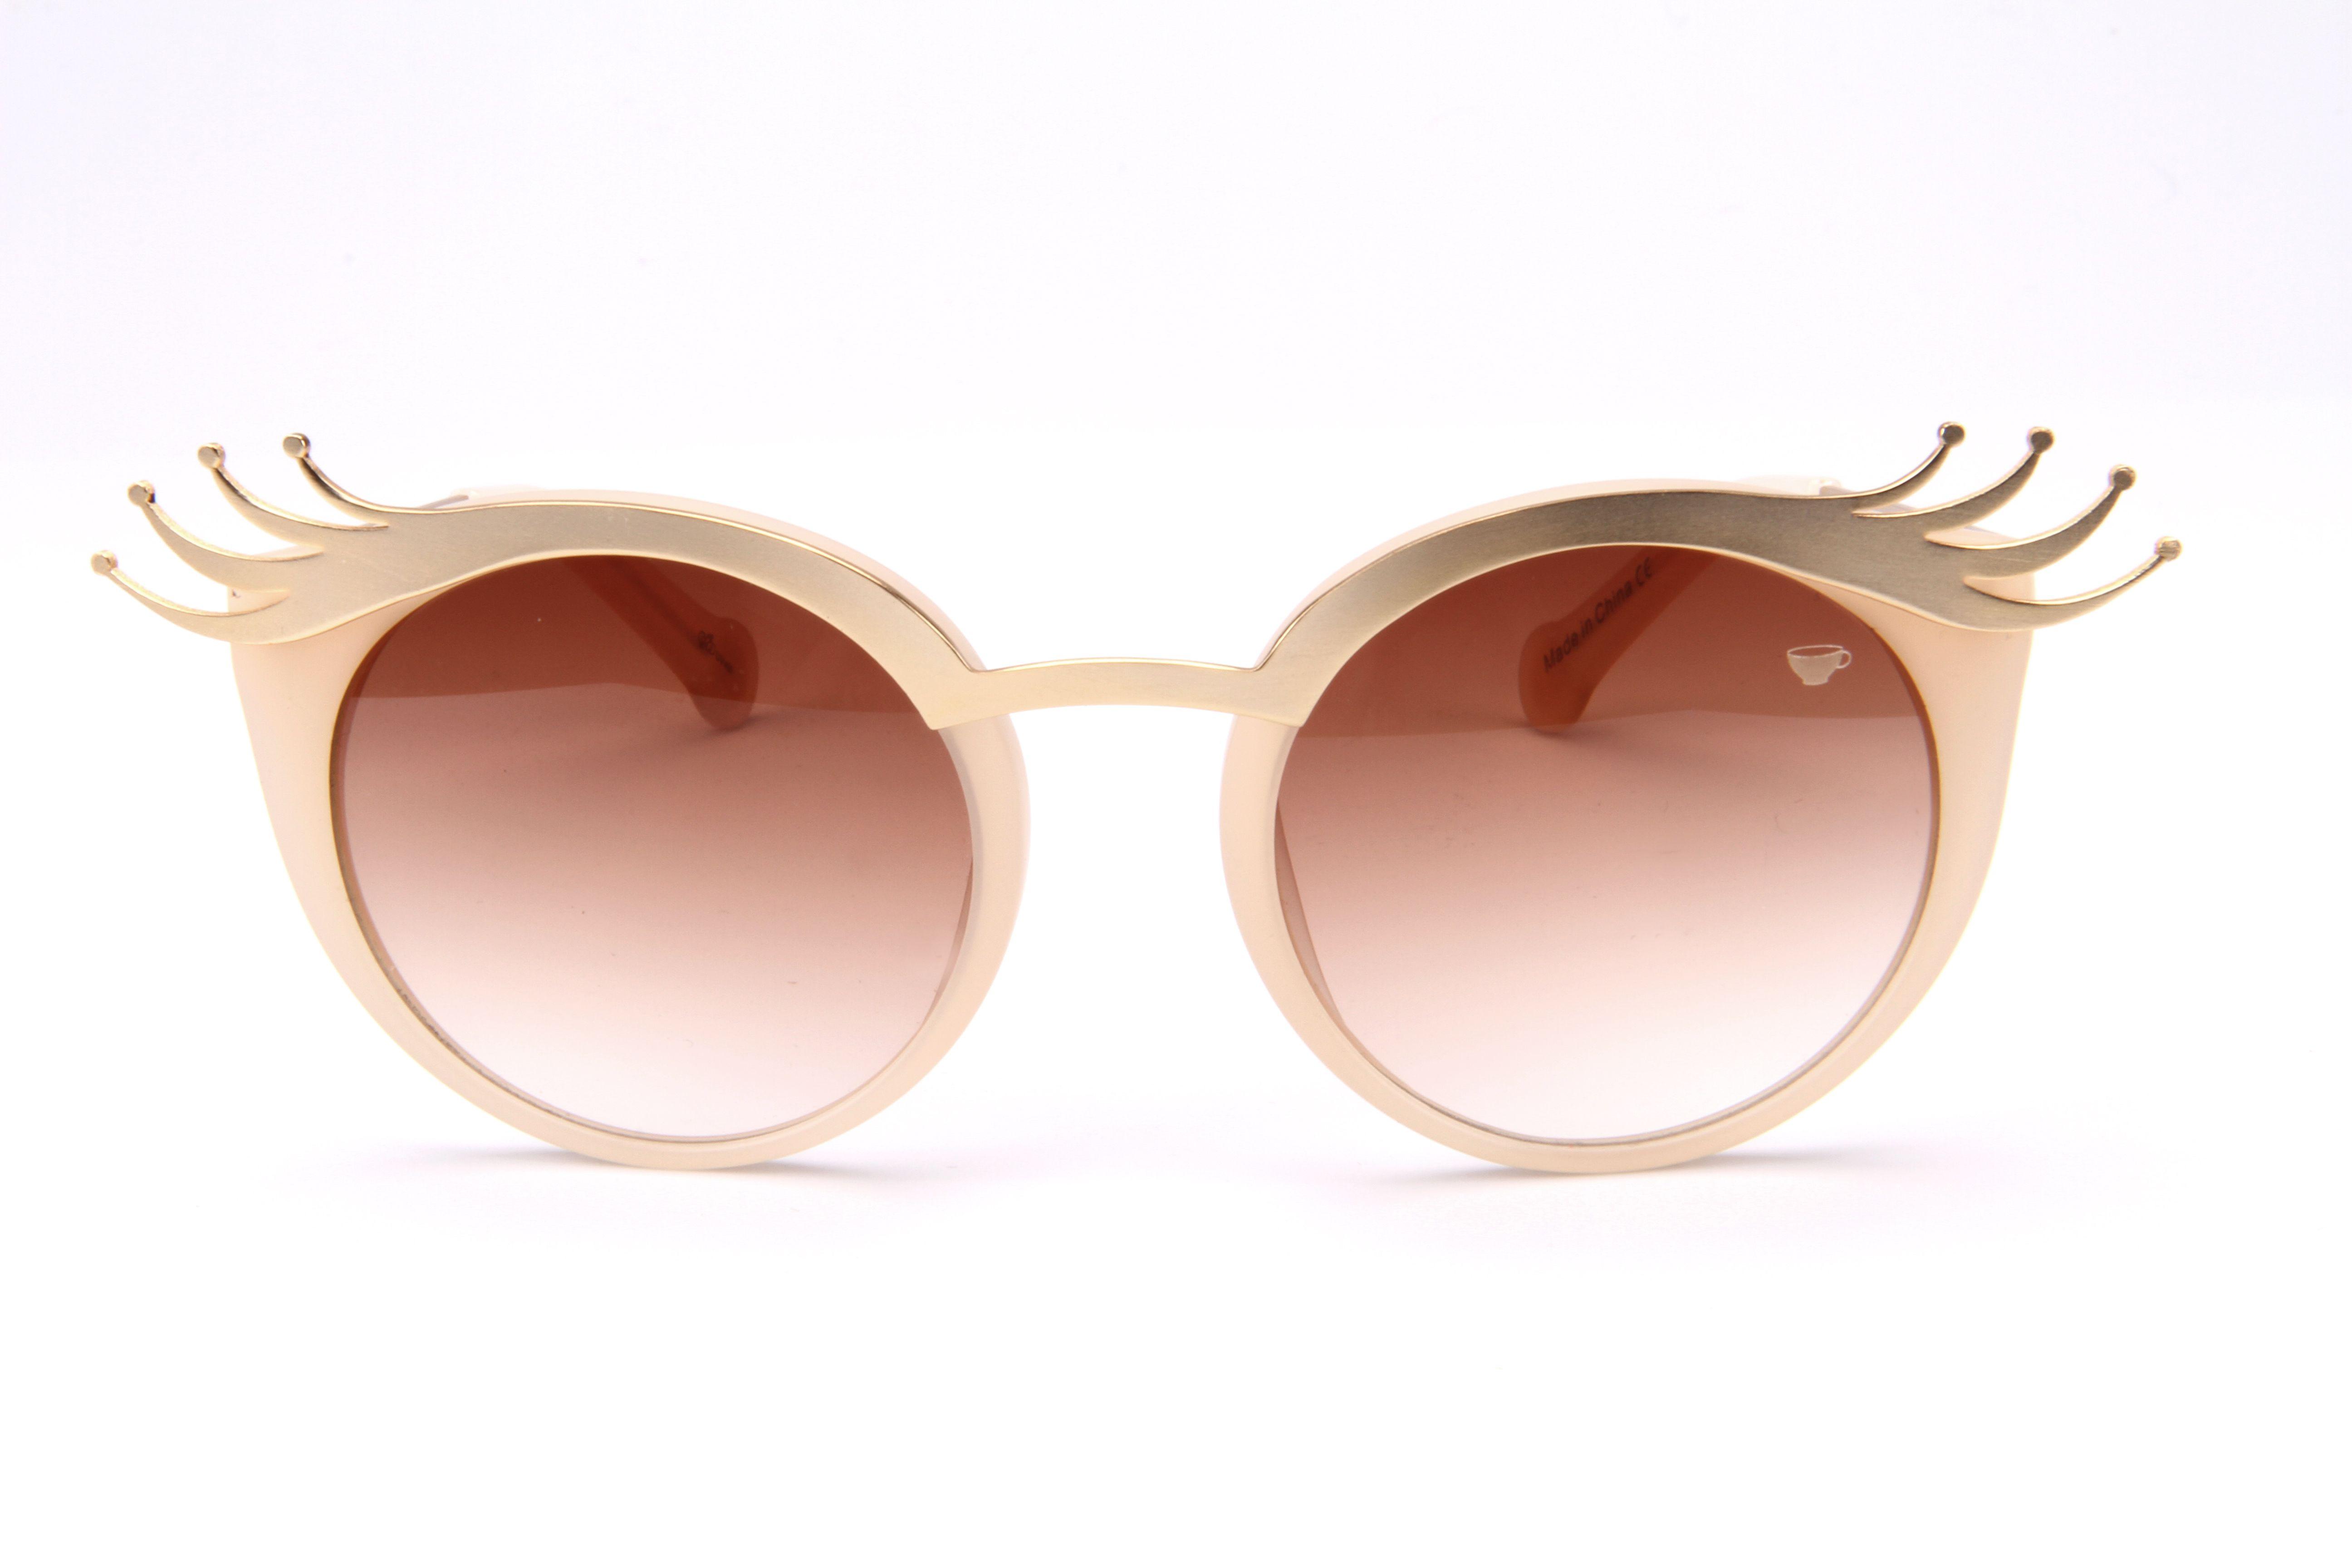 Oculos Cilios Chilli Beans Chillibeans Ideia De Look Ideias